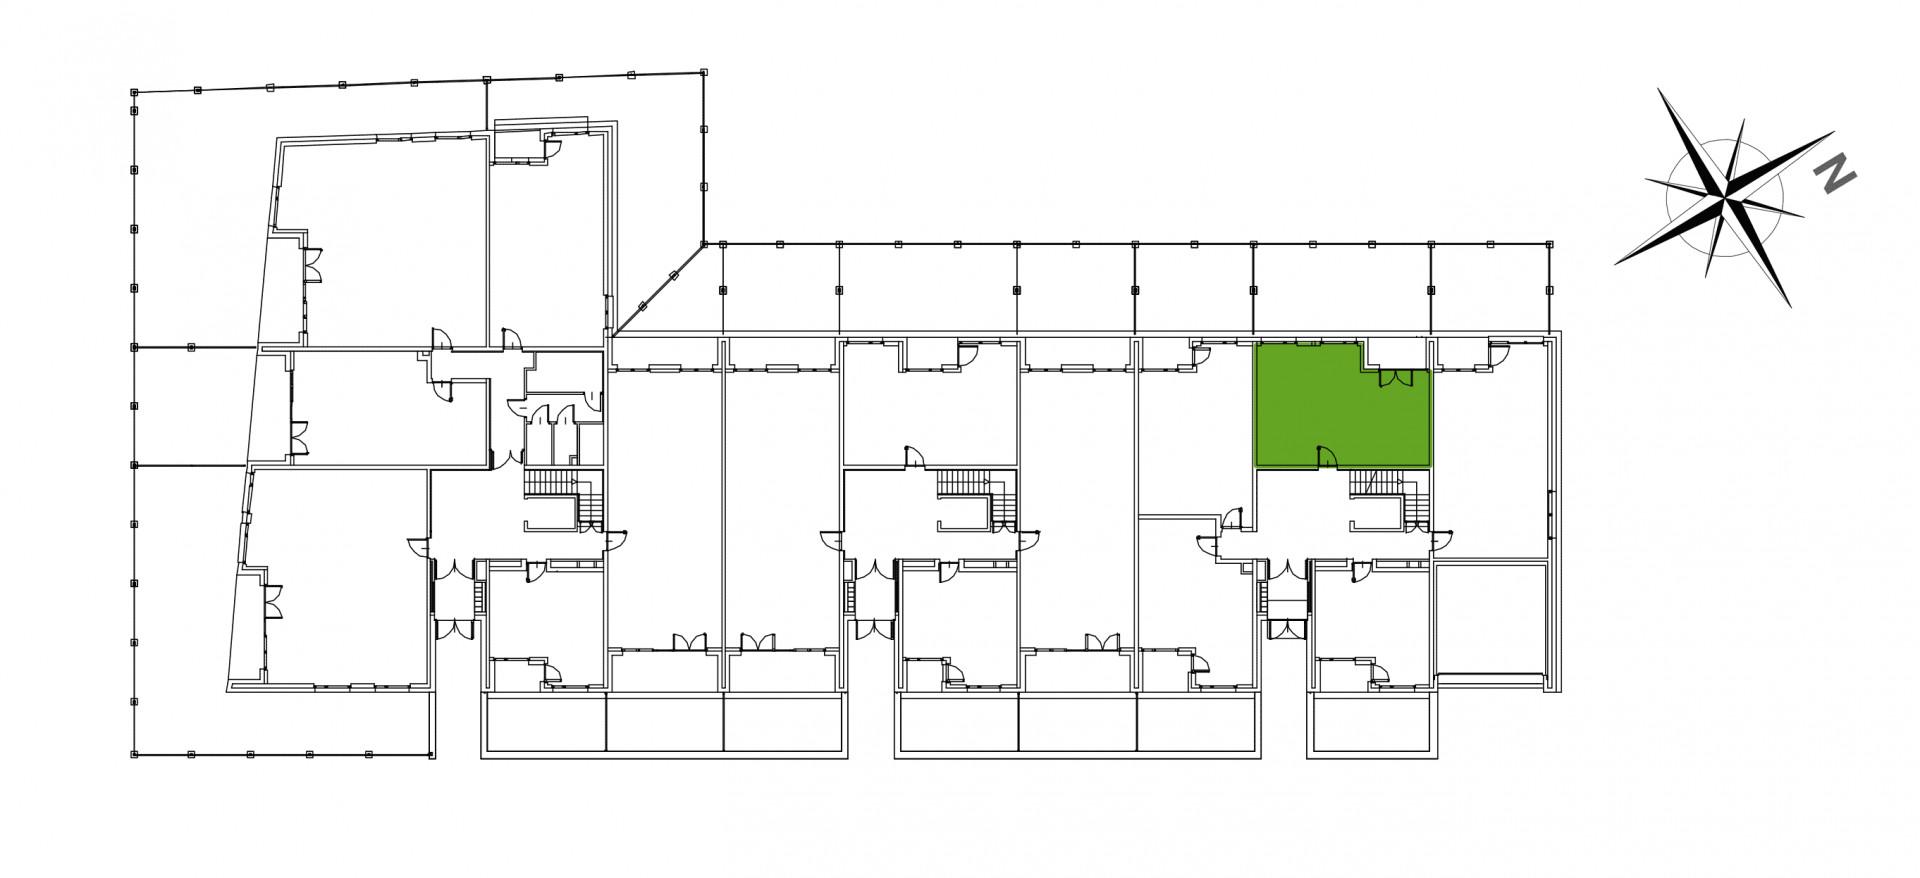 Mazowiecka 72 / apartament nr 3 rzut 2